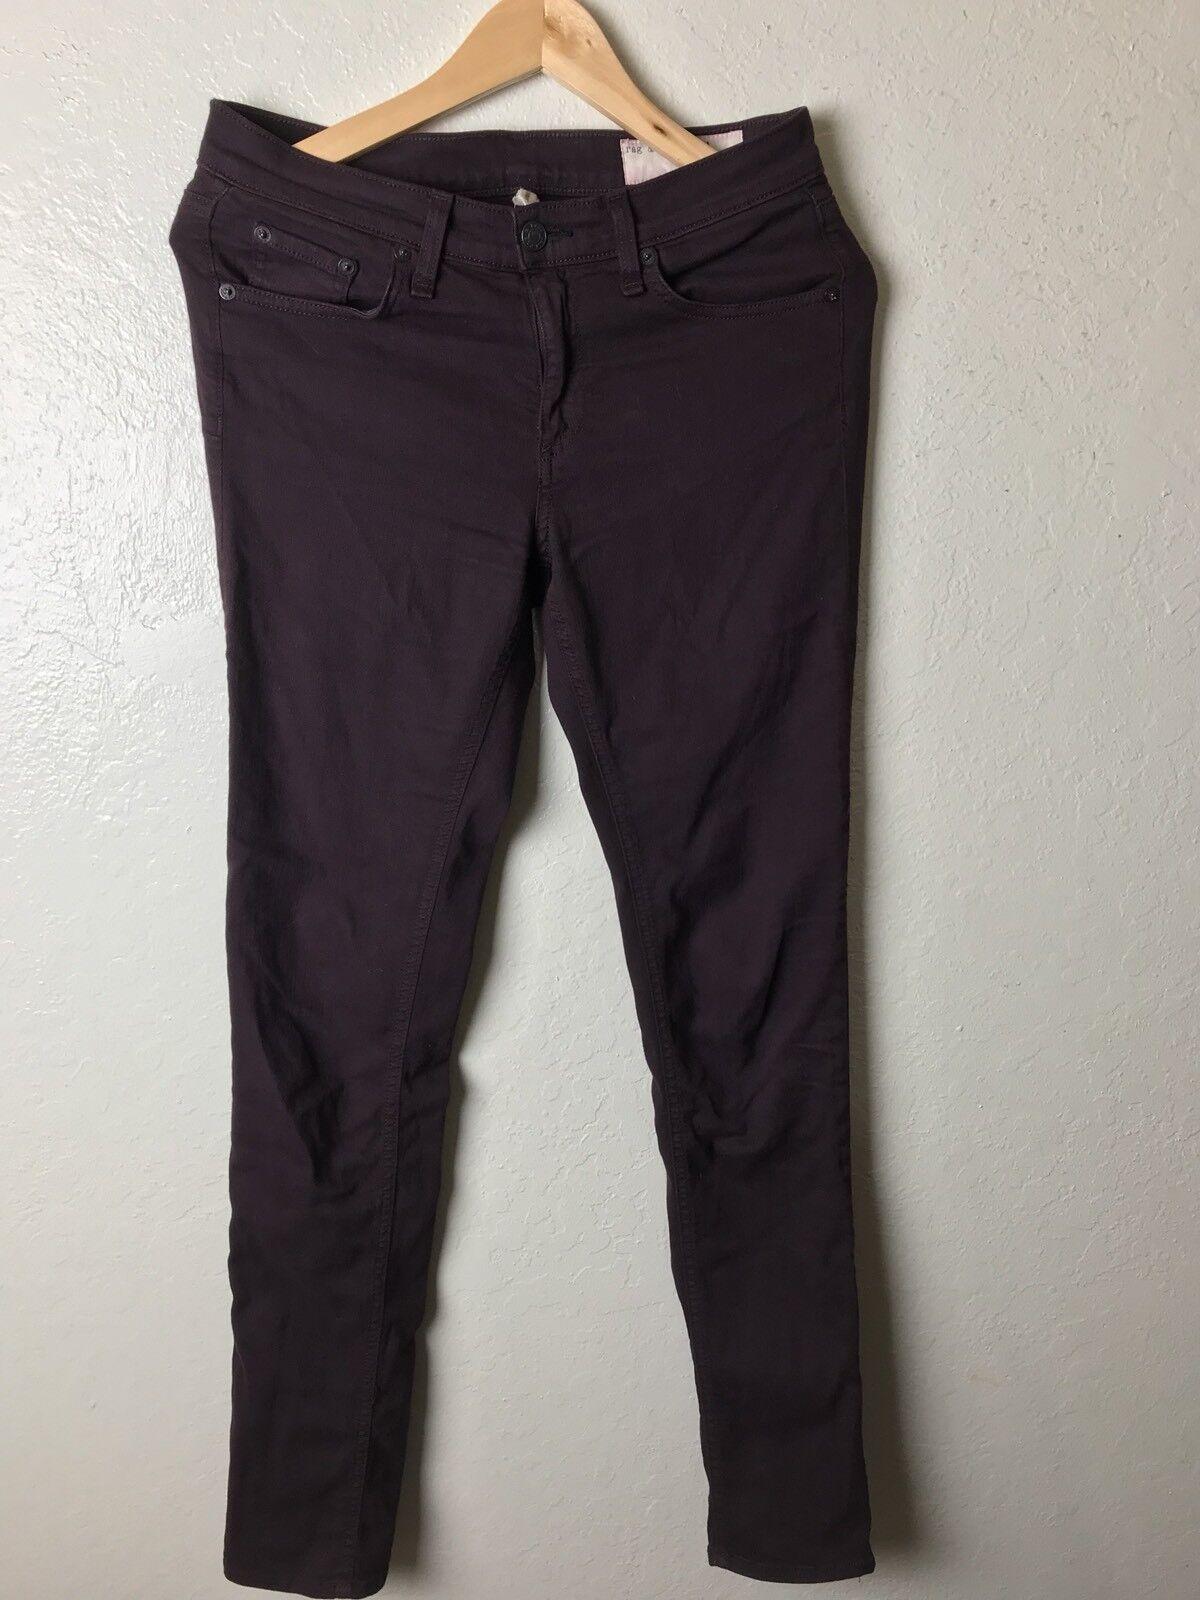 Rag And Bone Women's Purple Skinny Jeans 27 X 30.5